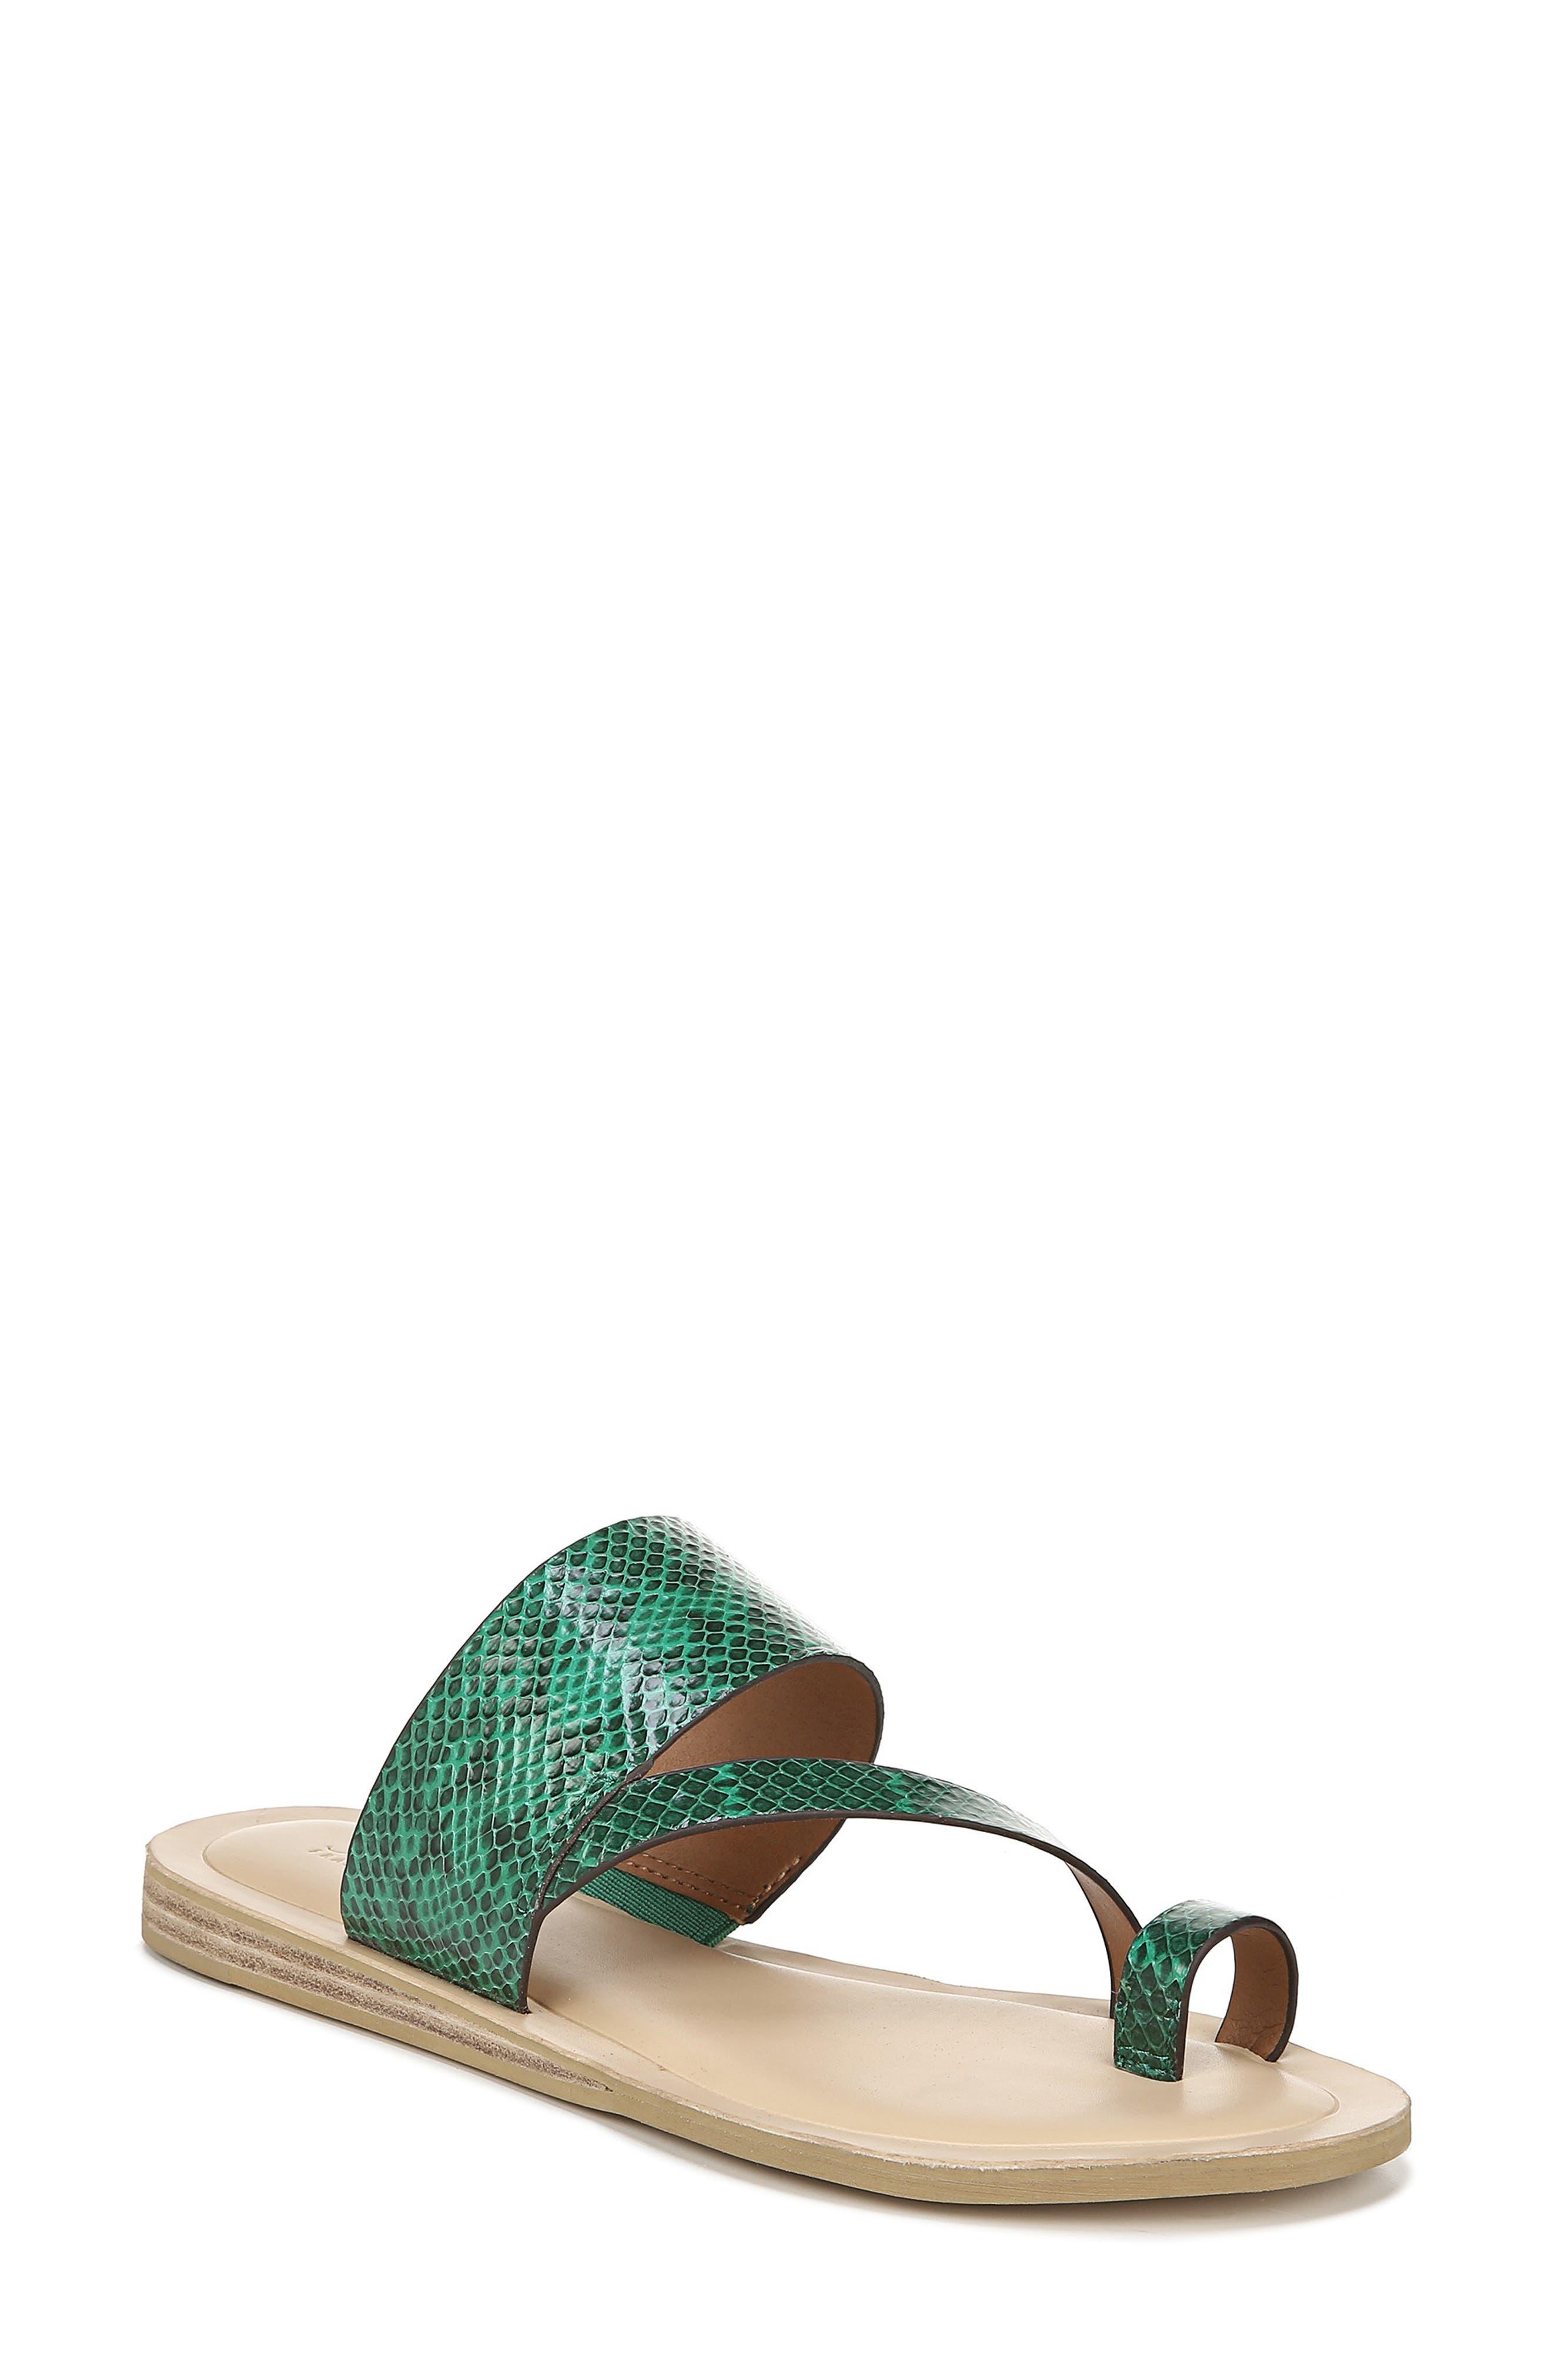 Sarto By Franco Sarto Leila Toe Loop Sandal, Green